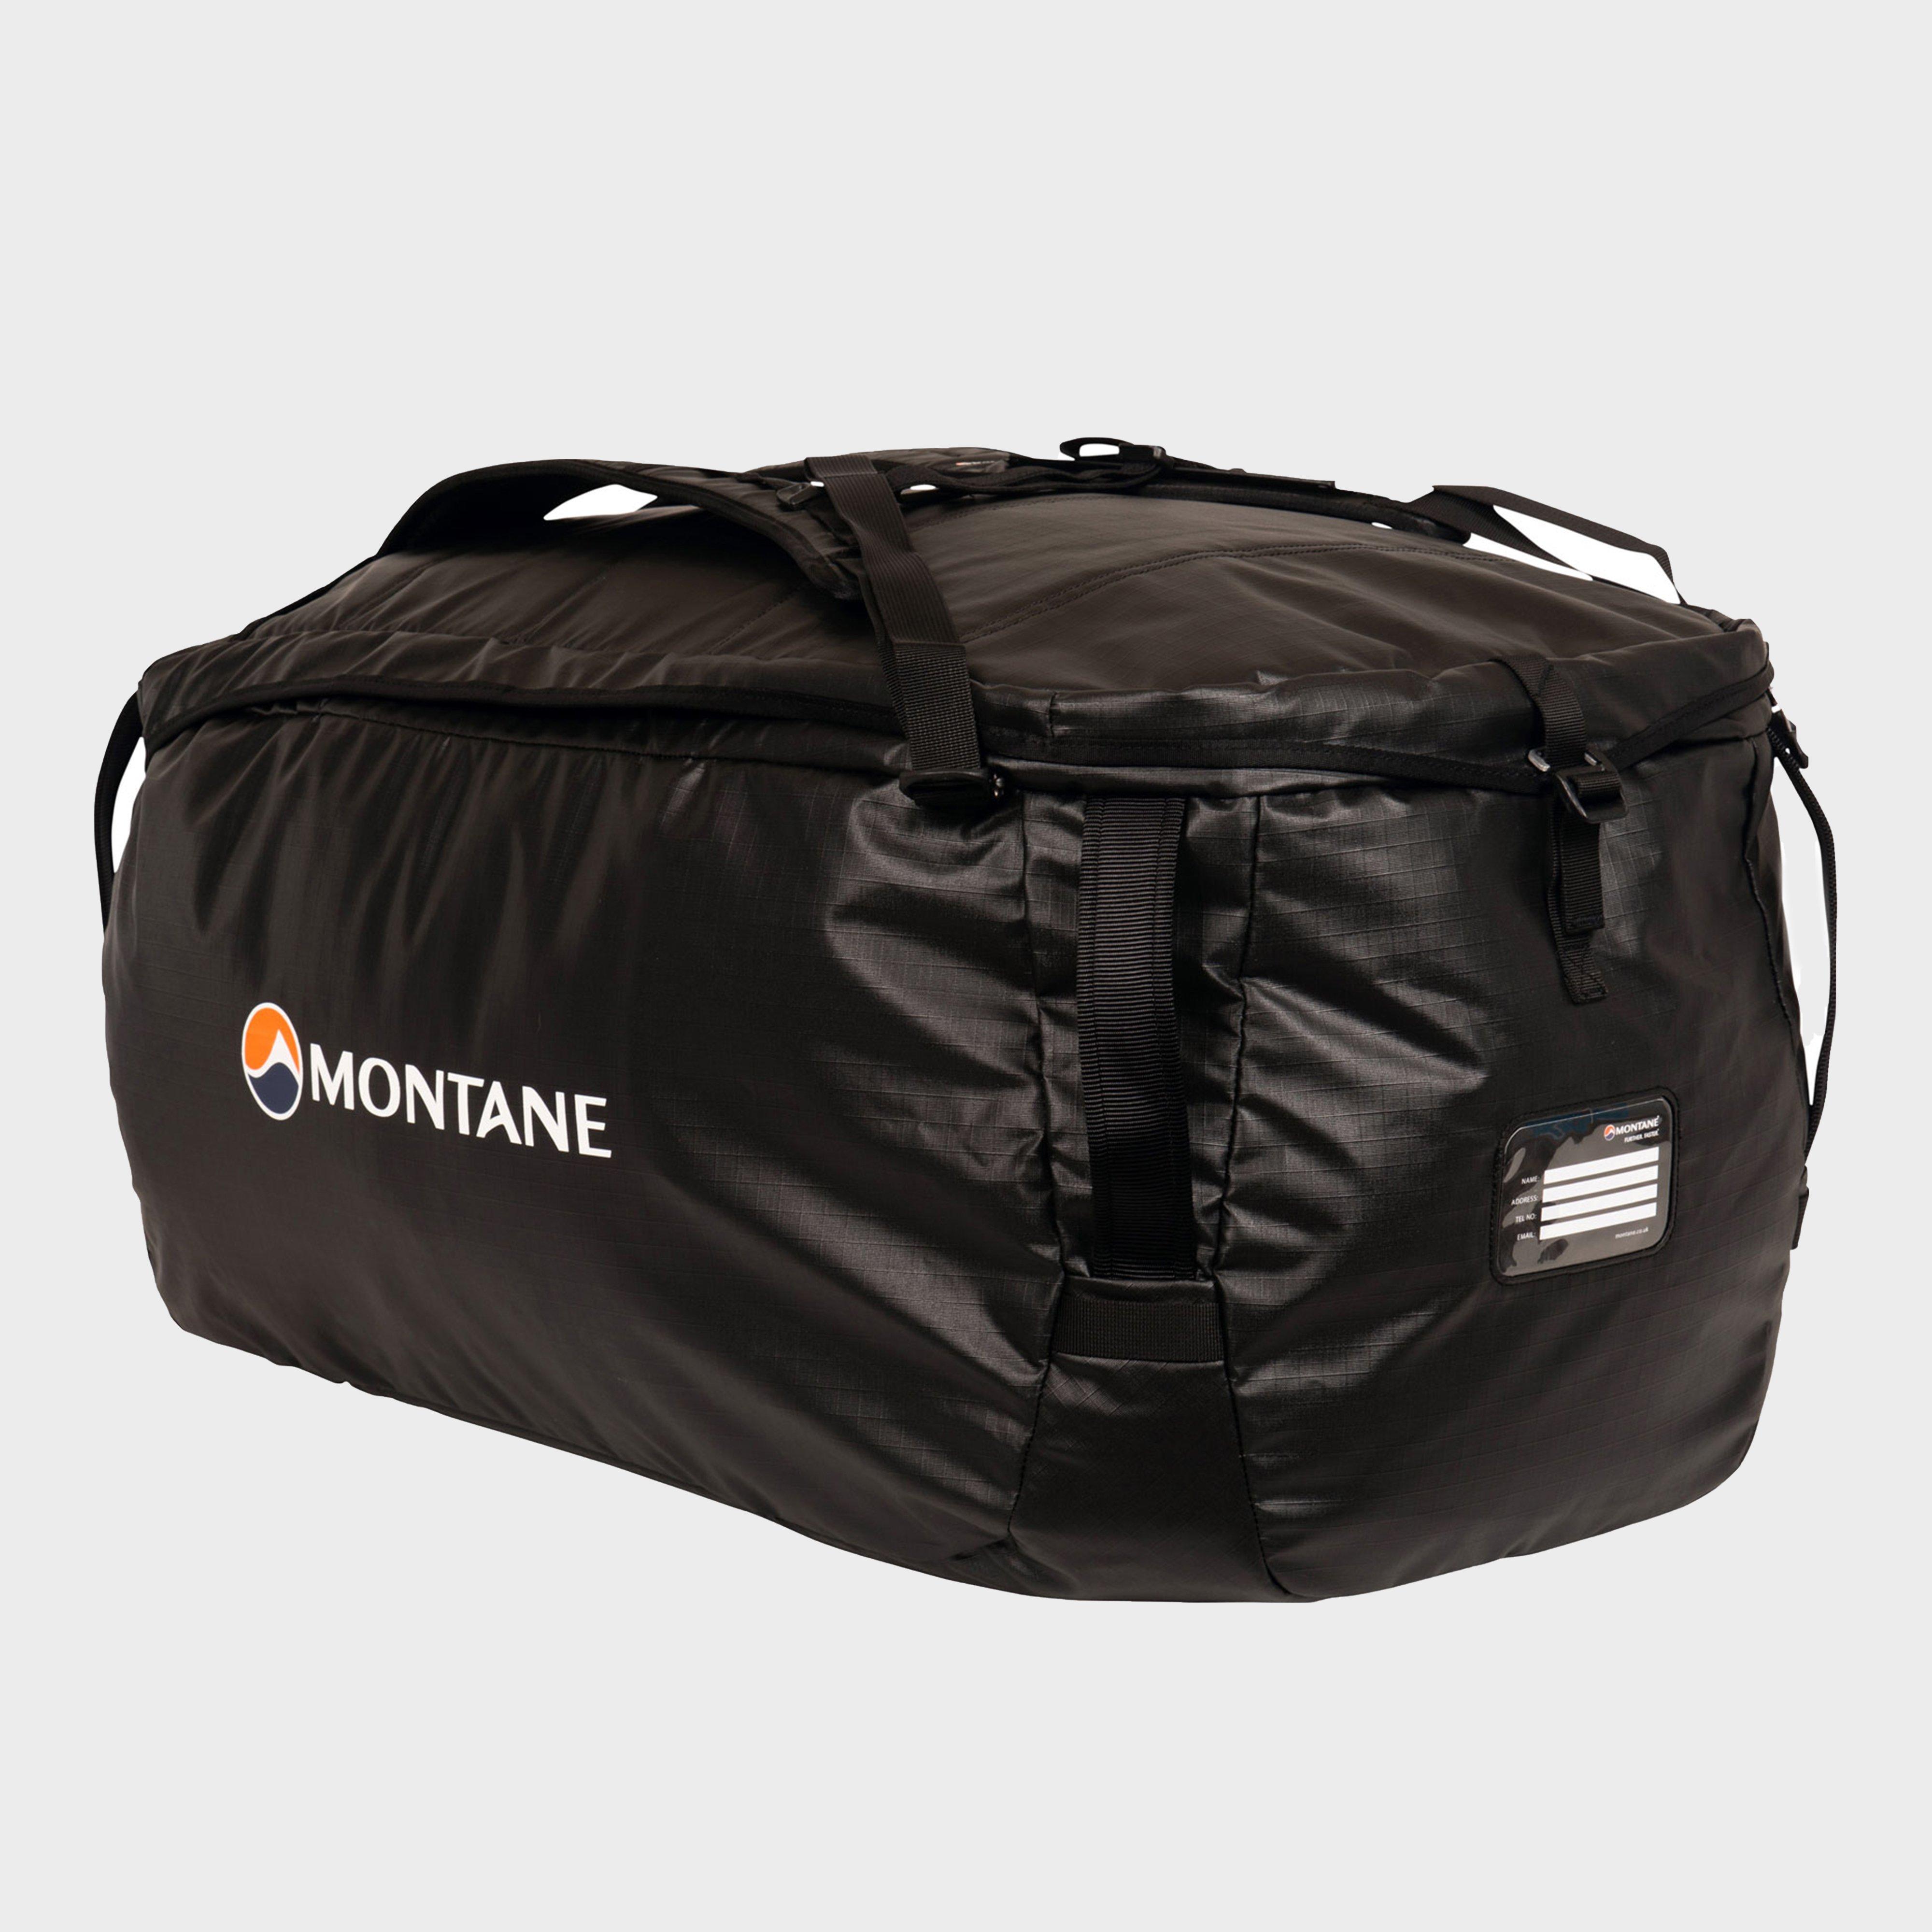 Montane Montane Transition 95